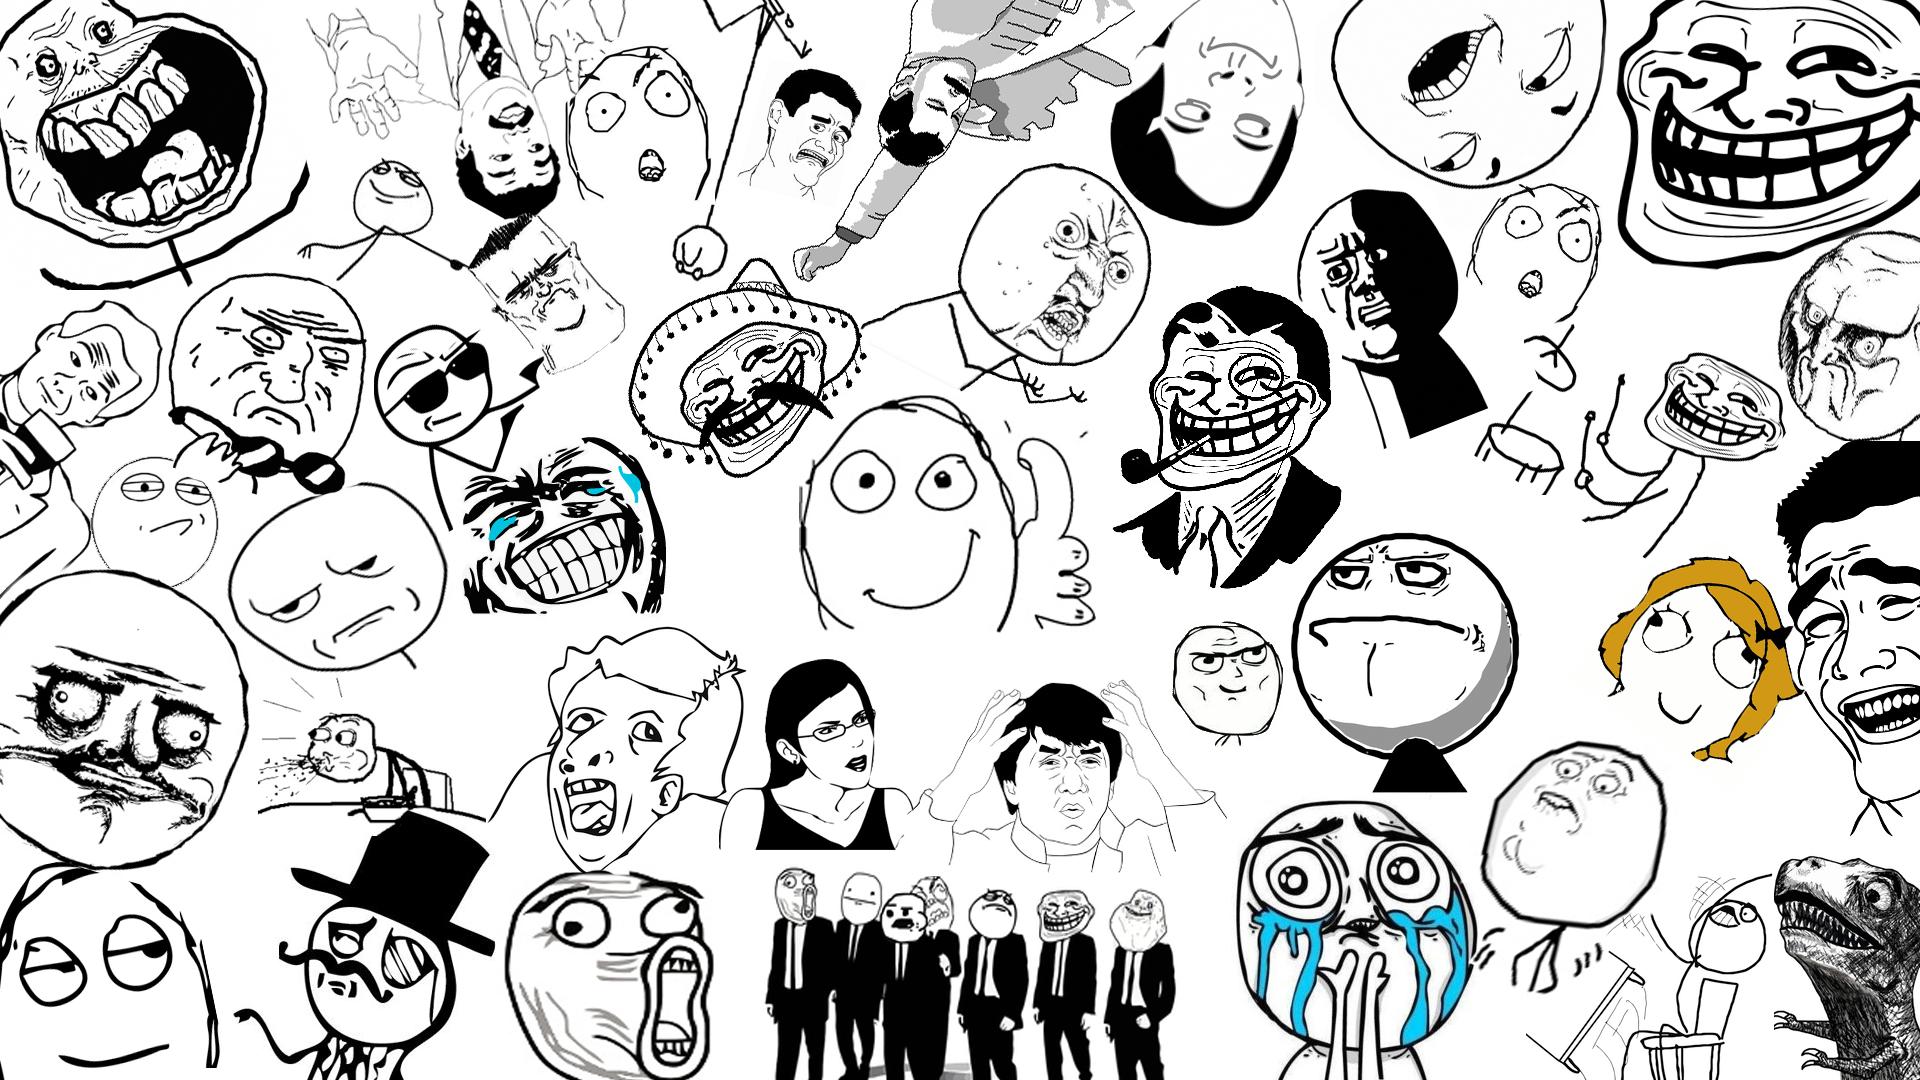 Meme Faces Exclusive HD Wallpapers 2937 1920x1080